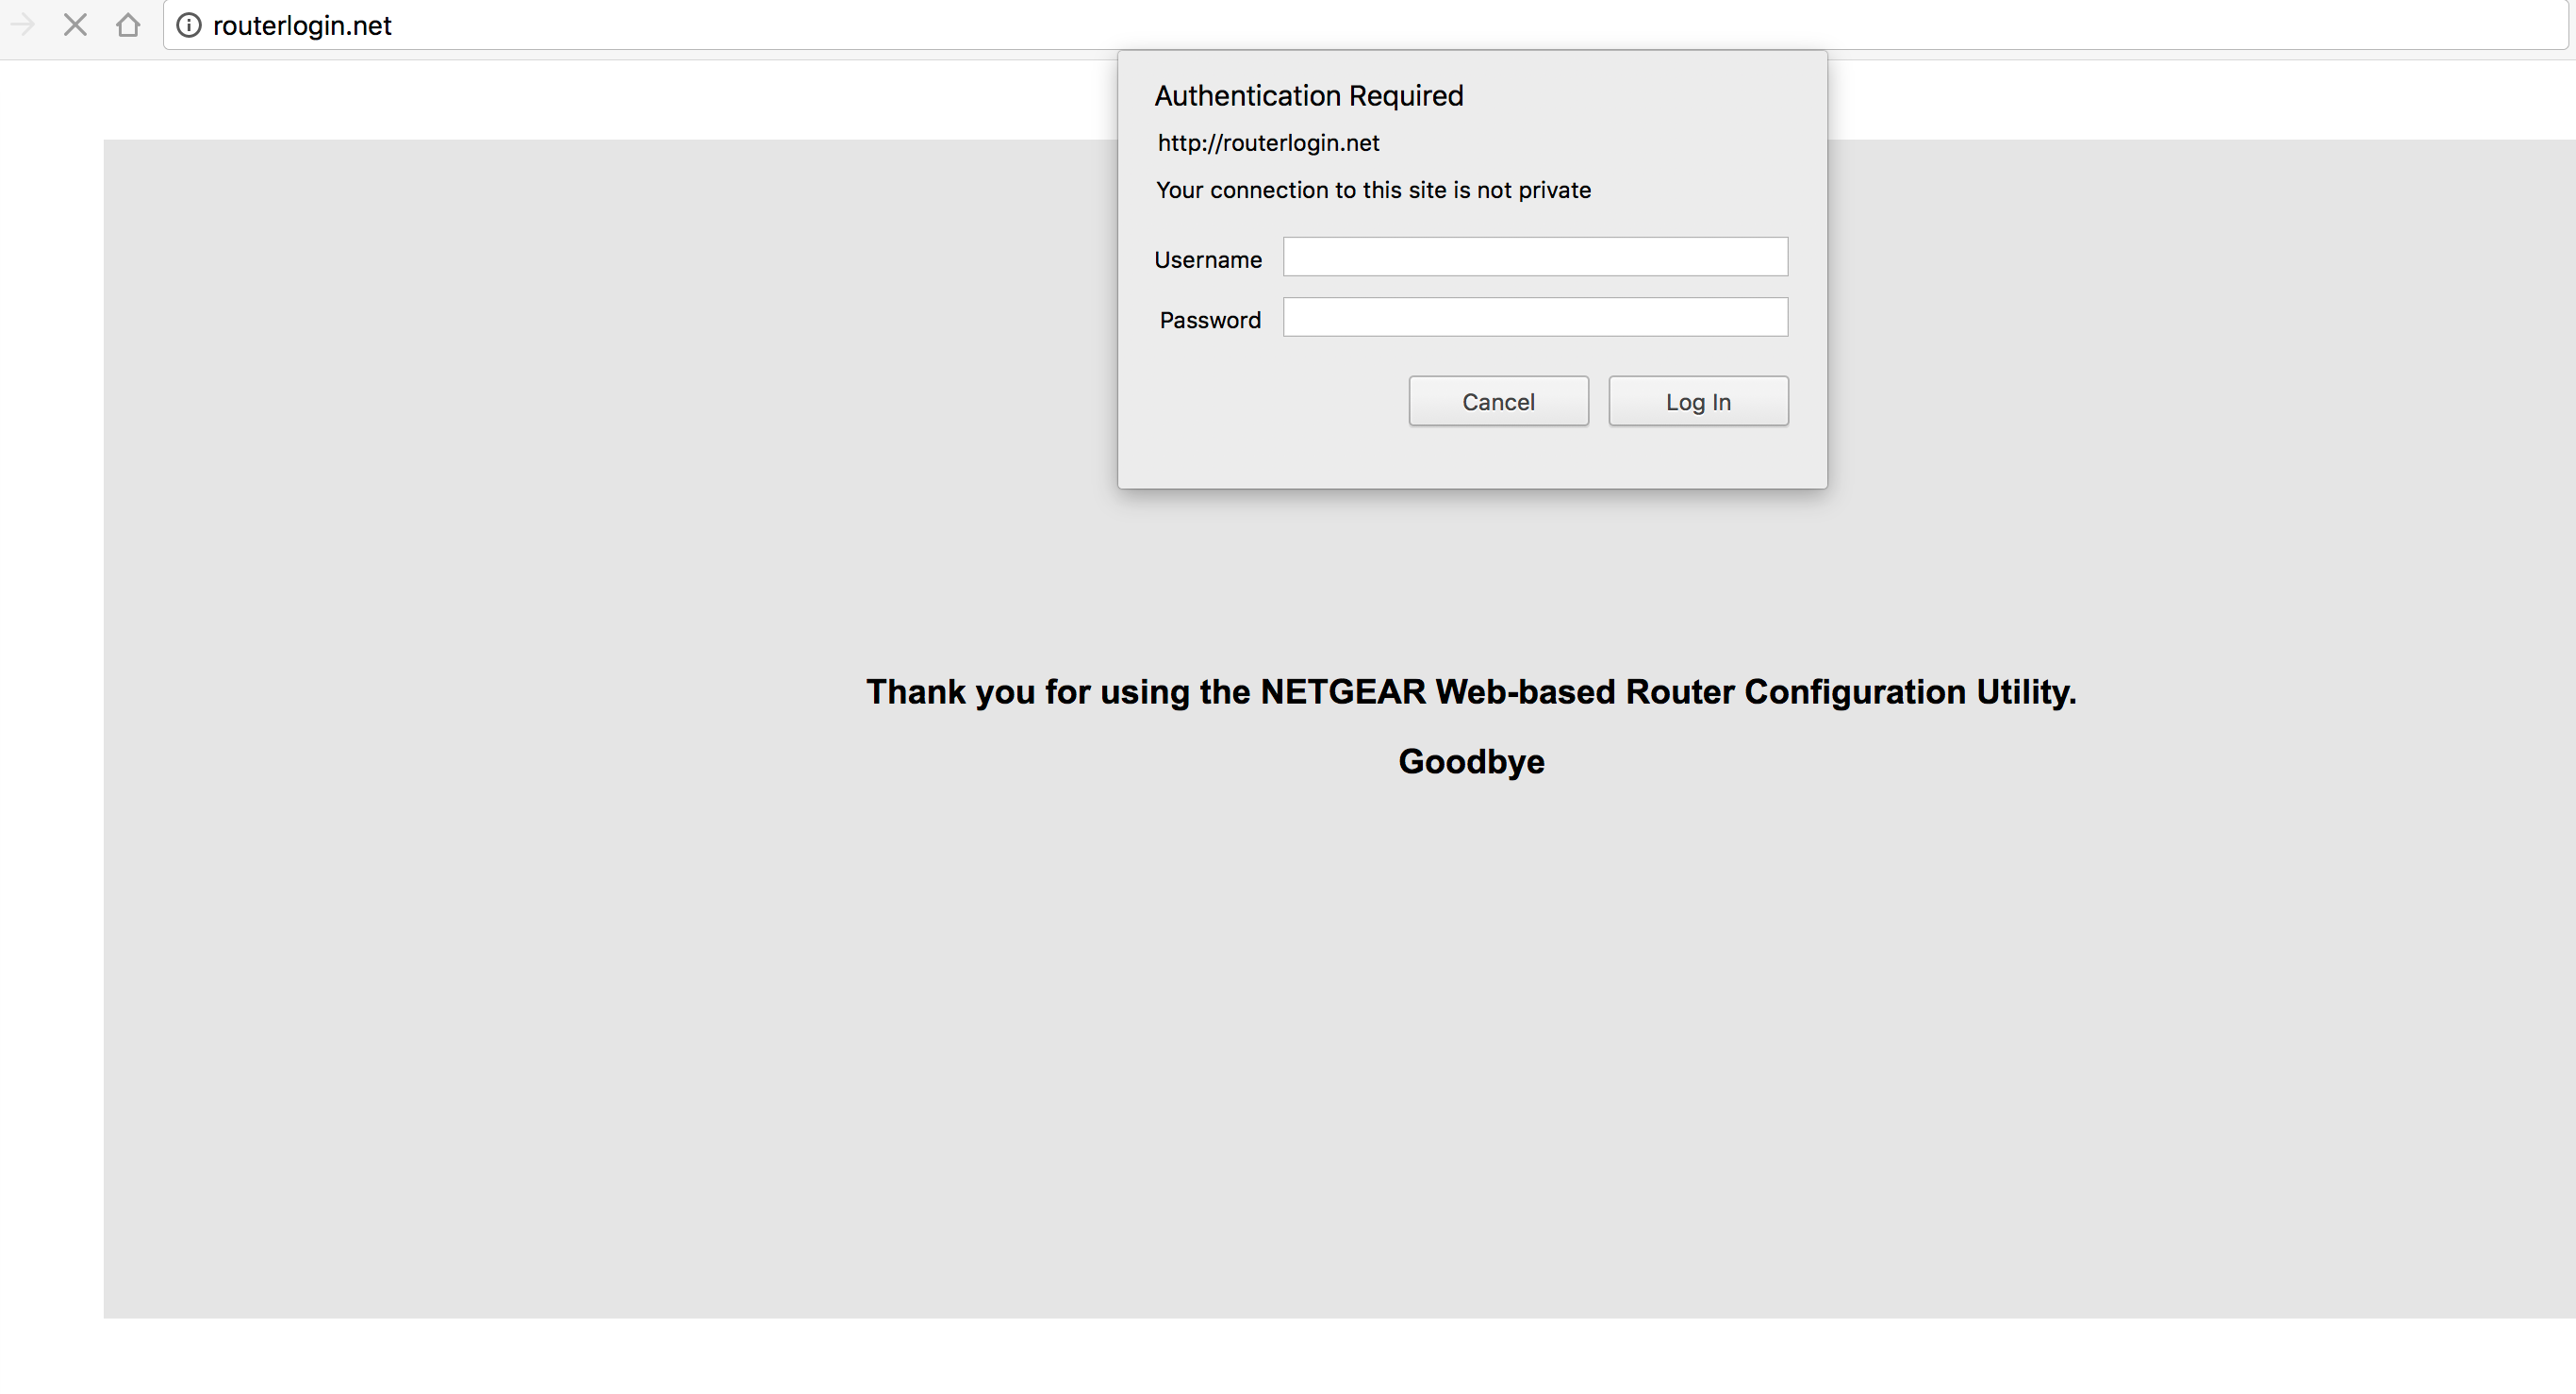 Account security concerns on NETGEAR GENIE - NETGEAR Communities